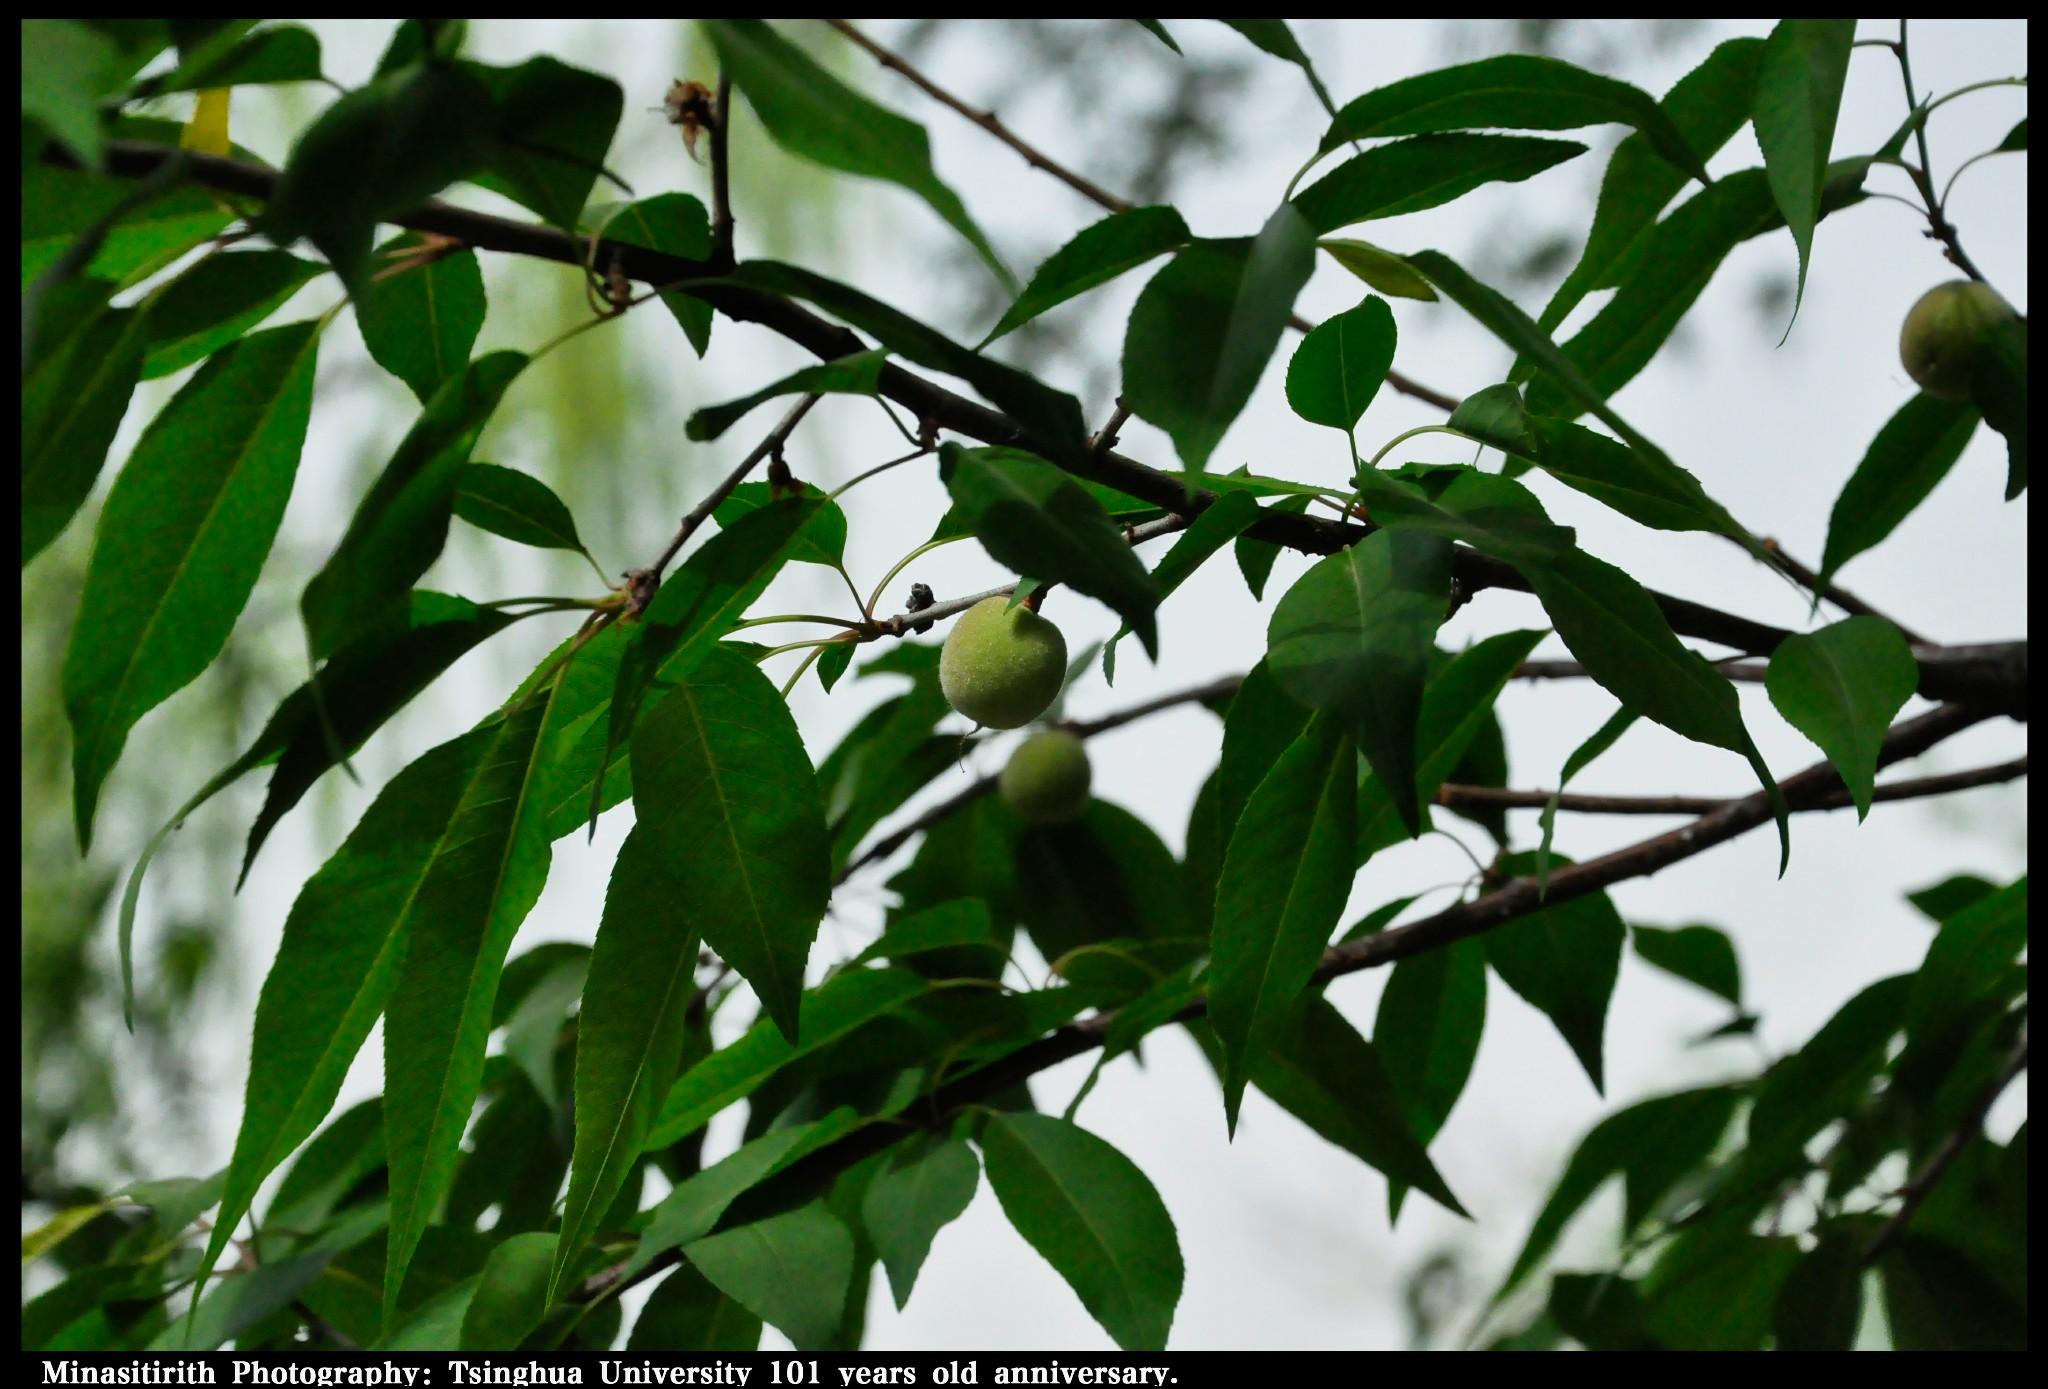 Photo: www.minasitirith.devaintart.com